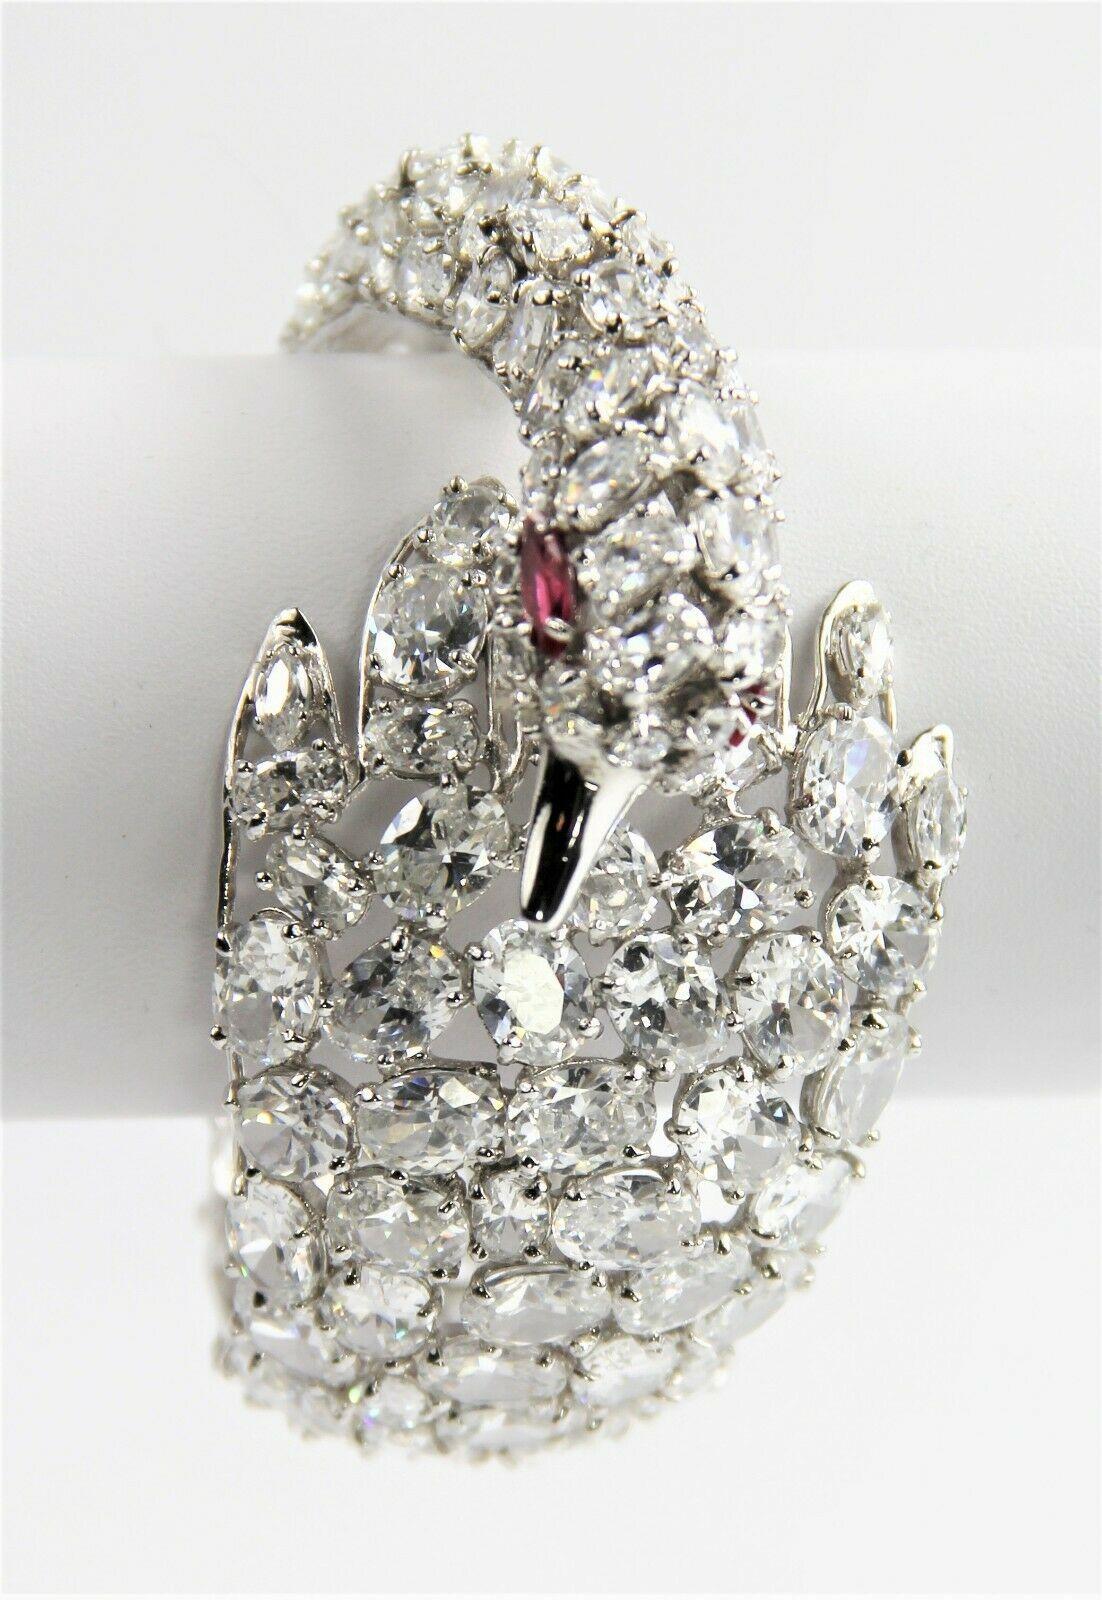 ESTATE VINTAGE Jewelry JARIN K RARE SWAN HINGED BANGLE BRACELET RUBY EYES & CZ